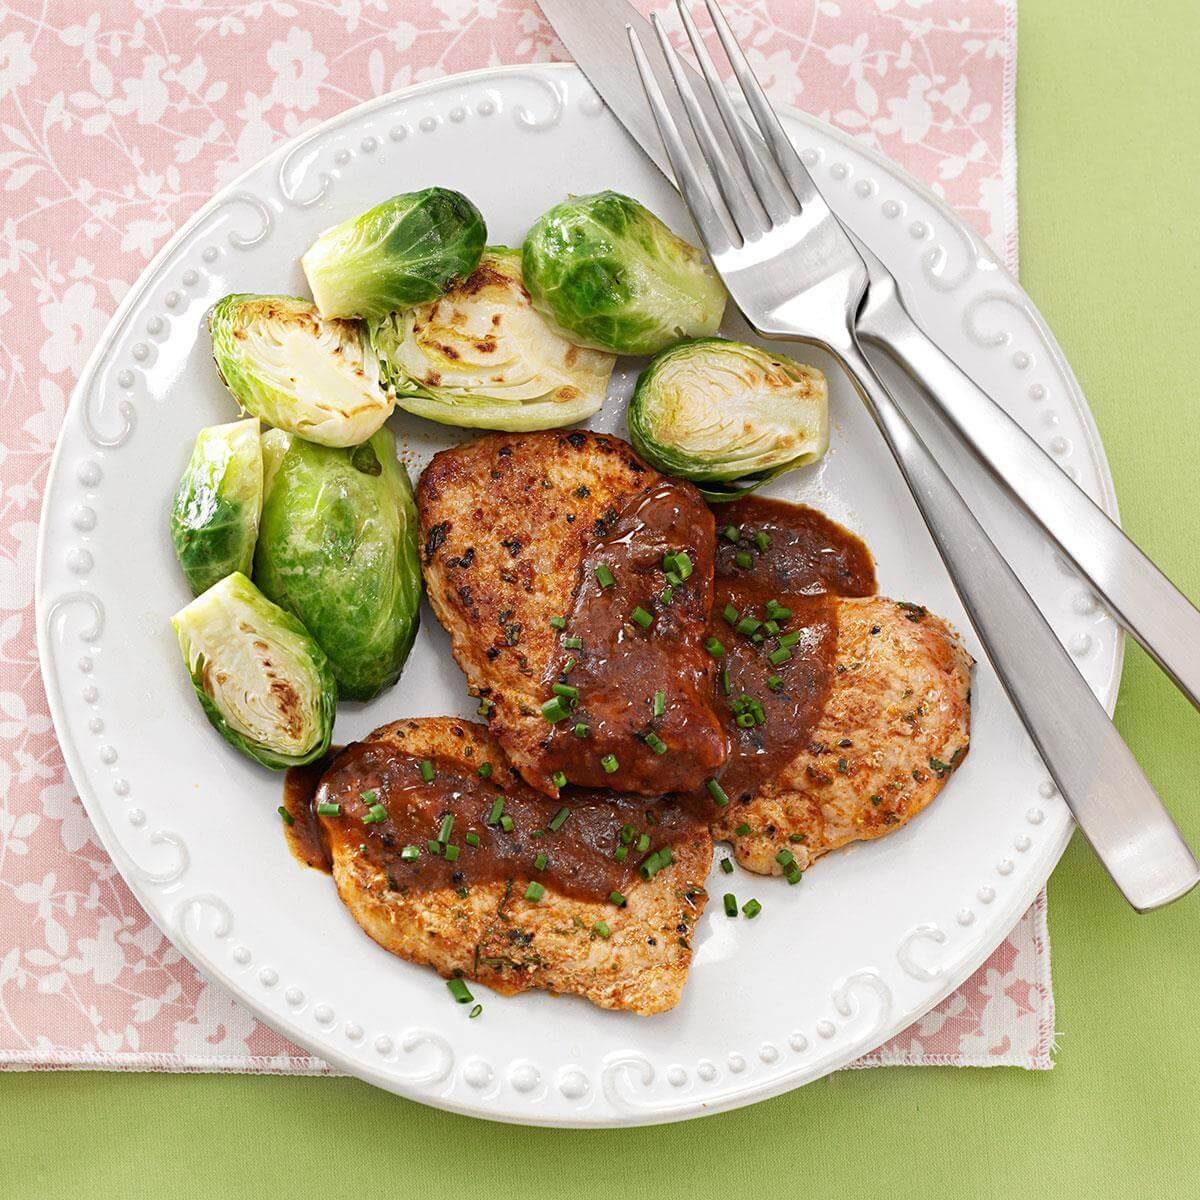 Pork Tenderloin Recipes: Bistro Herb-Rubbed Pork Tenderloin Recipe